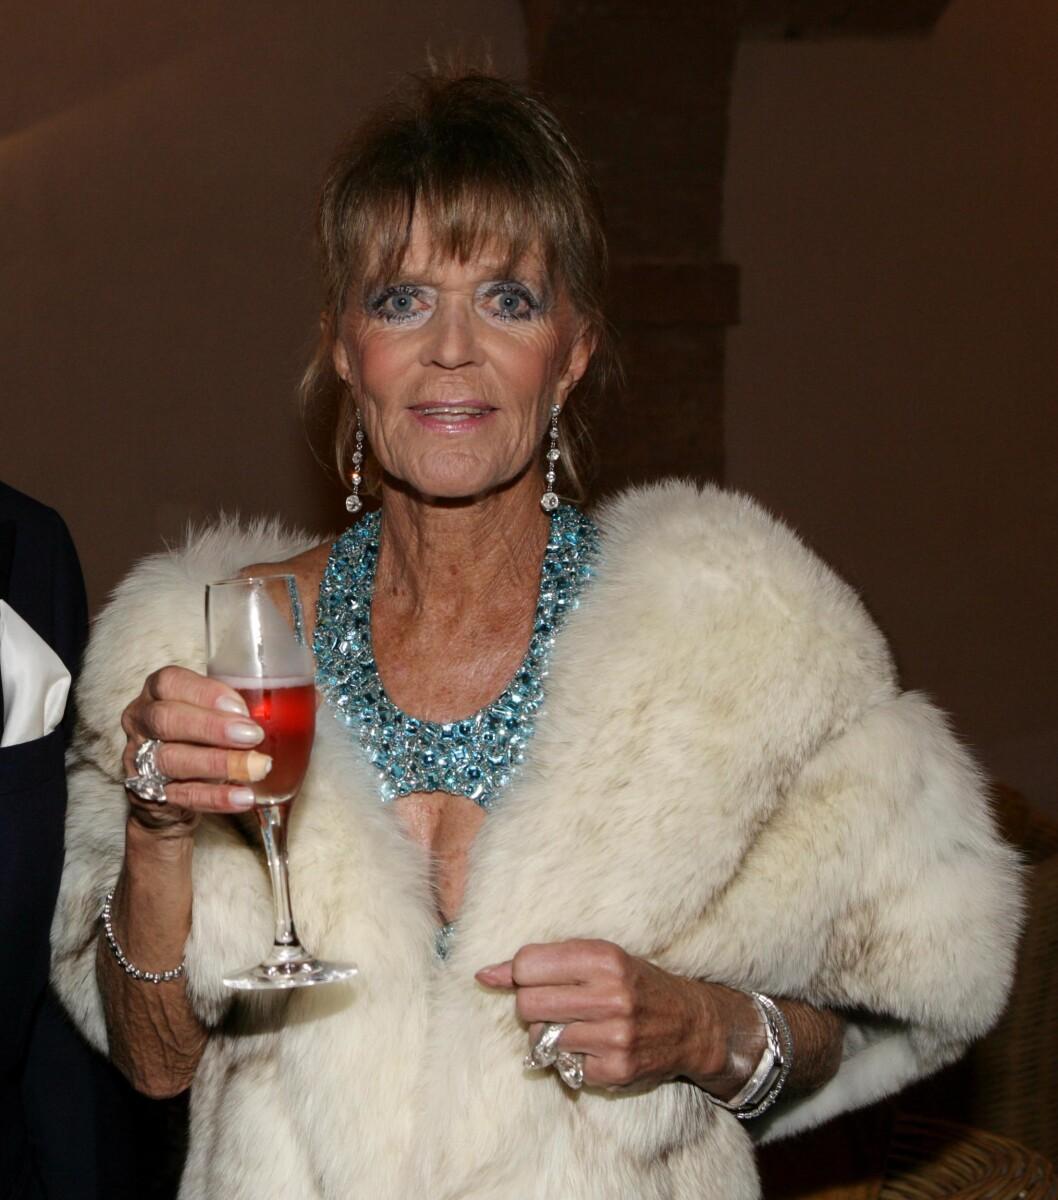 SKÅL: Prinsesse Birgitta feiret 70-årsdagen med sprudlende drikke i glasset. Foto: All Over